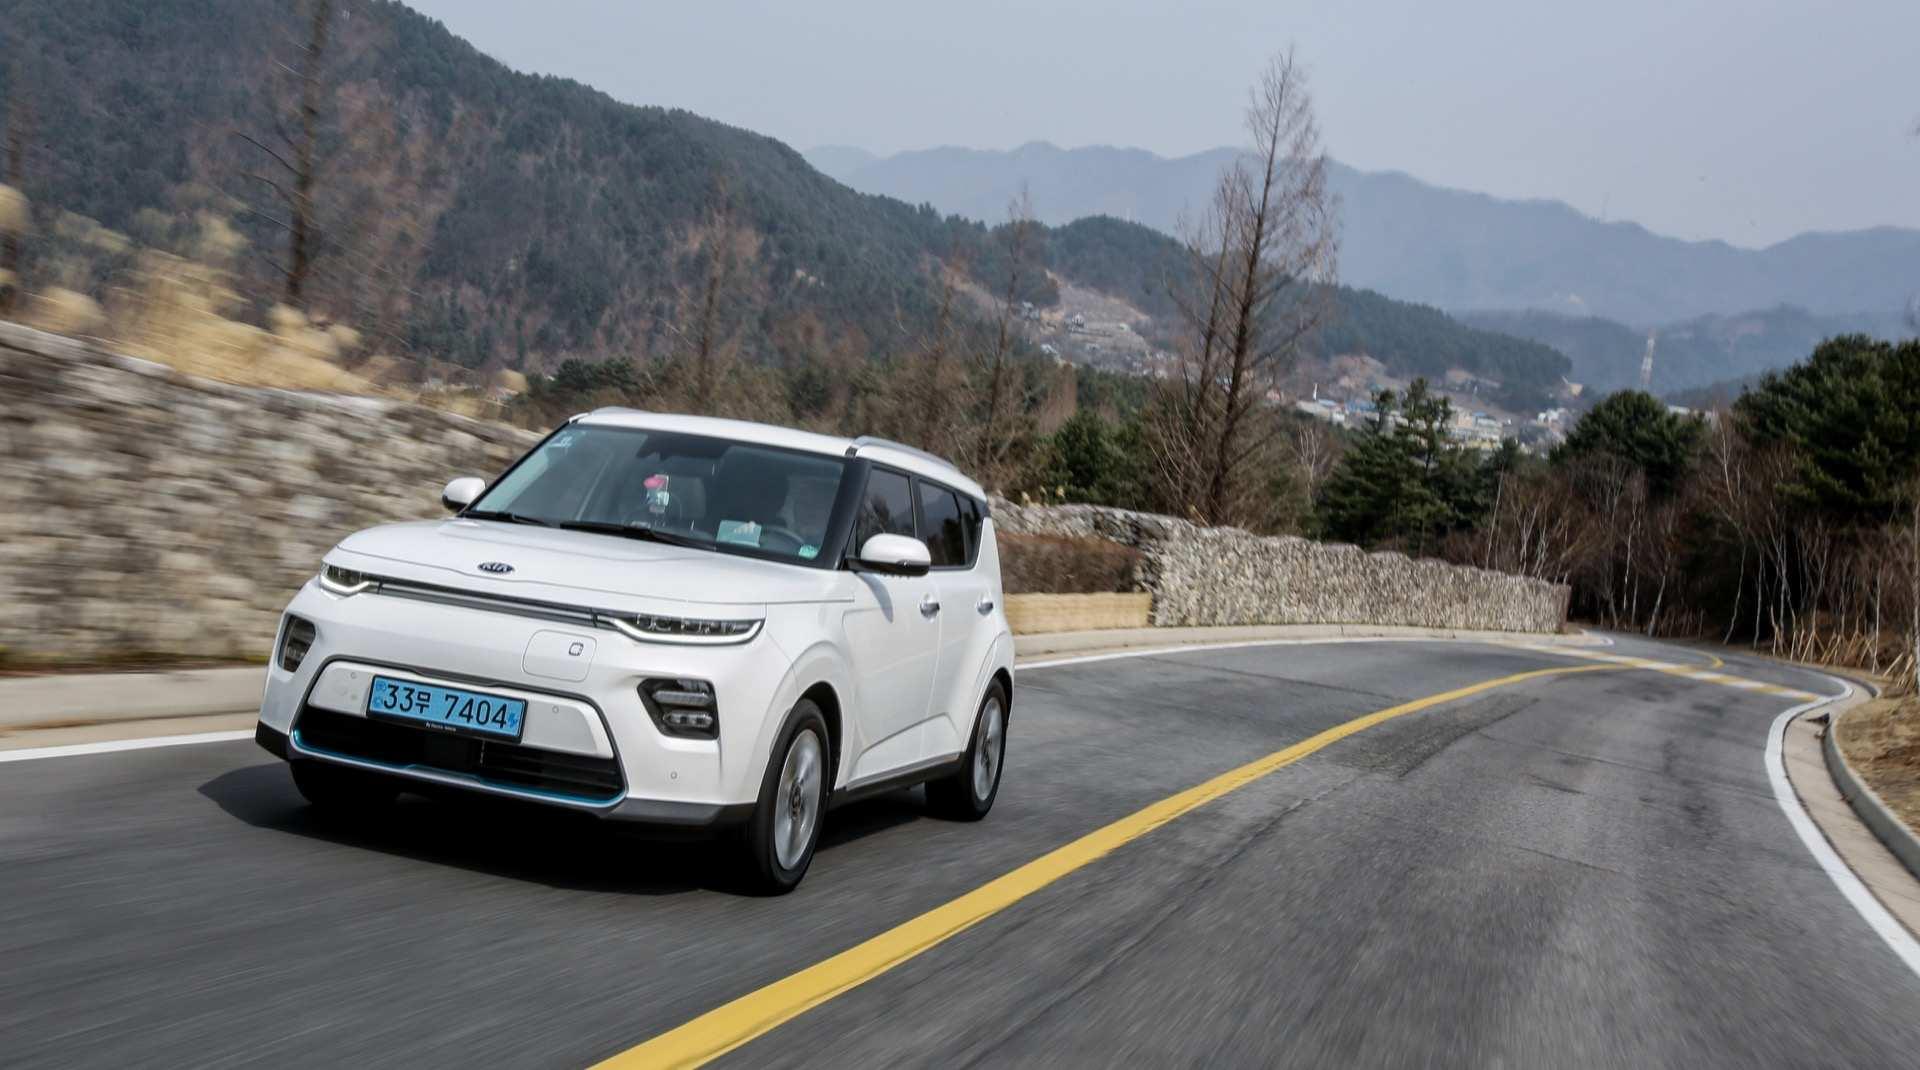 24 New Kia Electric 2020 Configurations with Kia Electric 2020